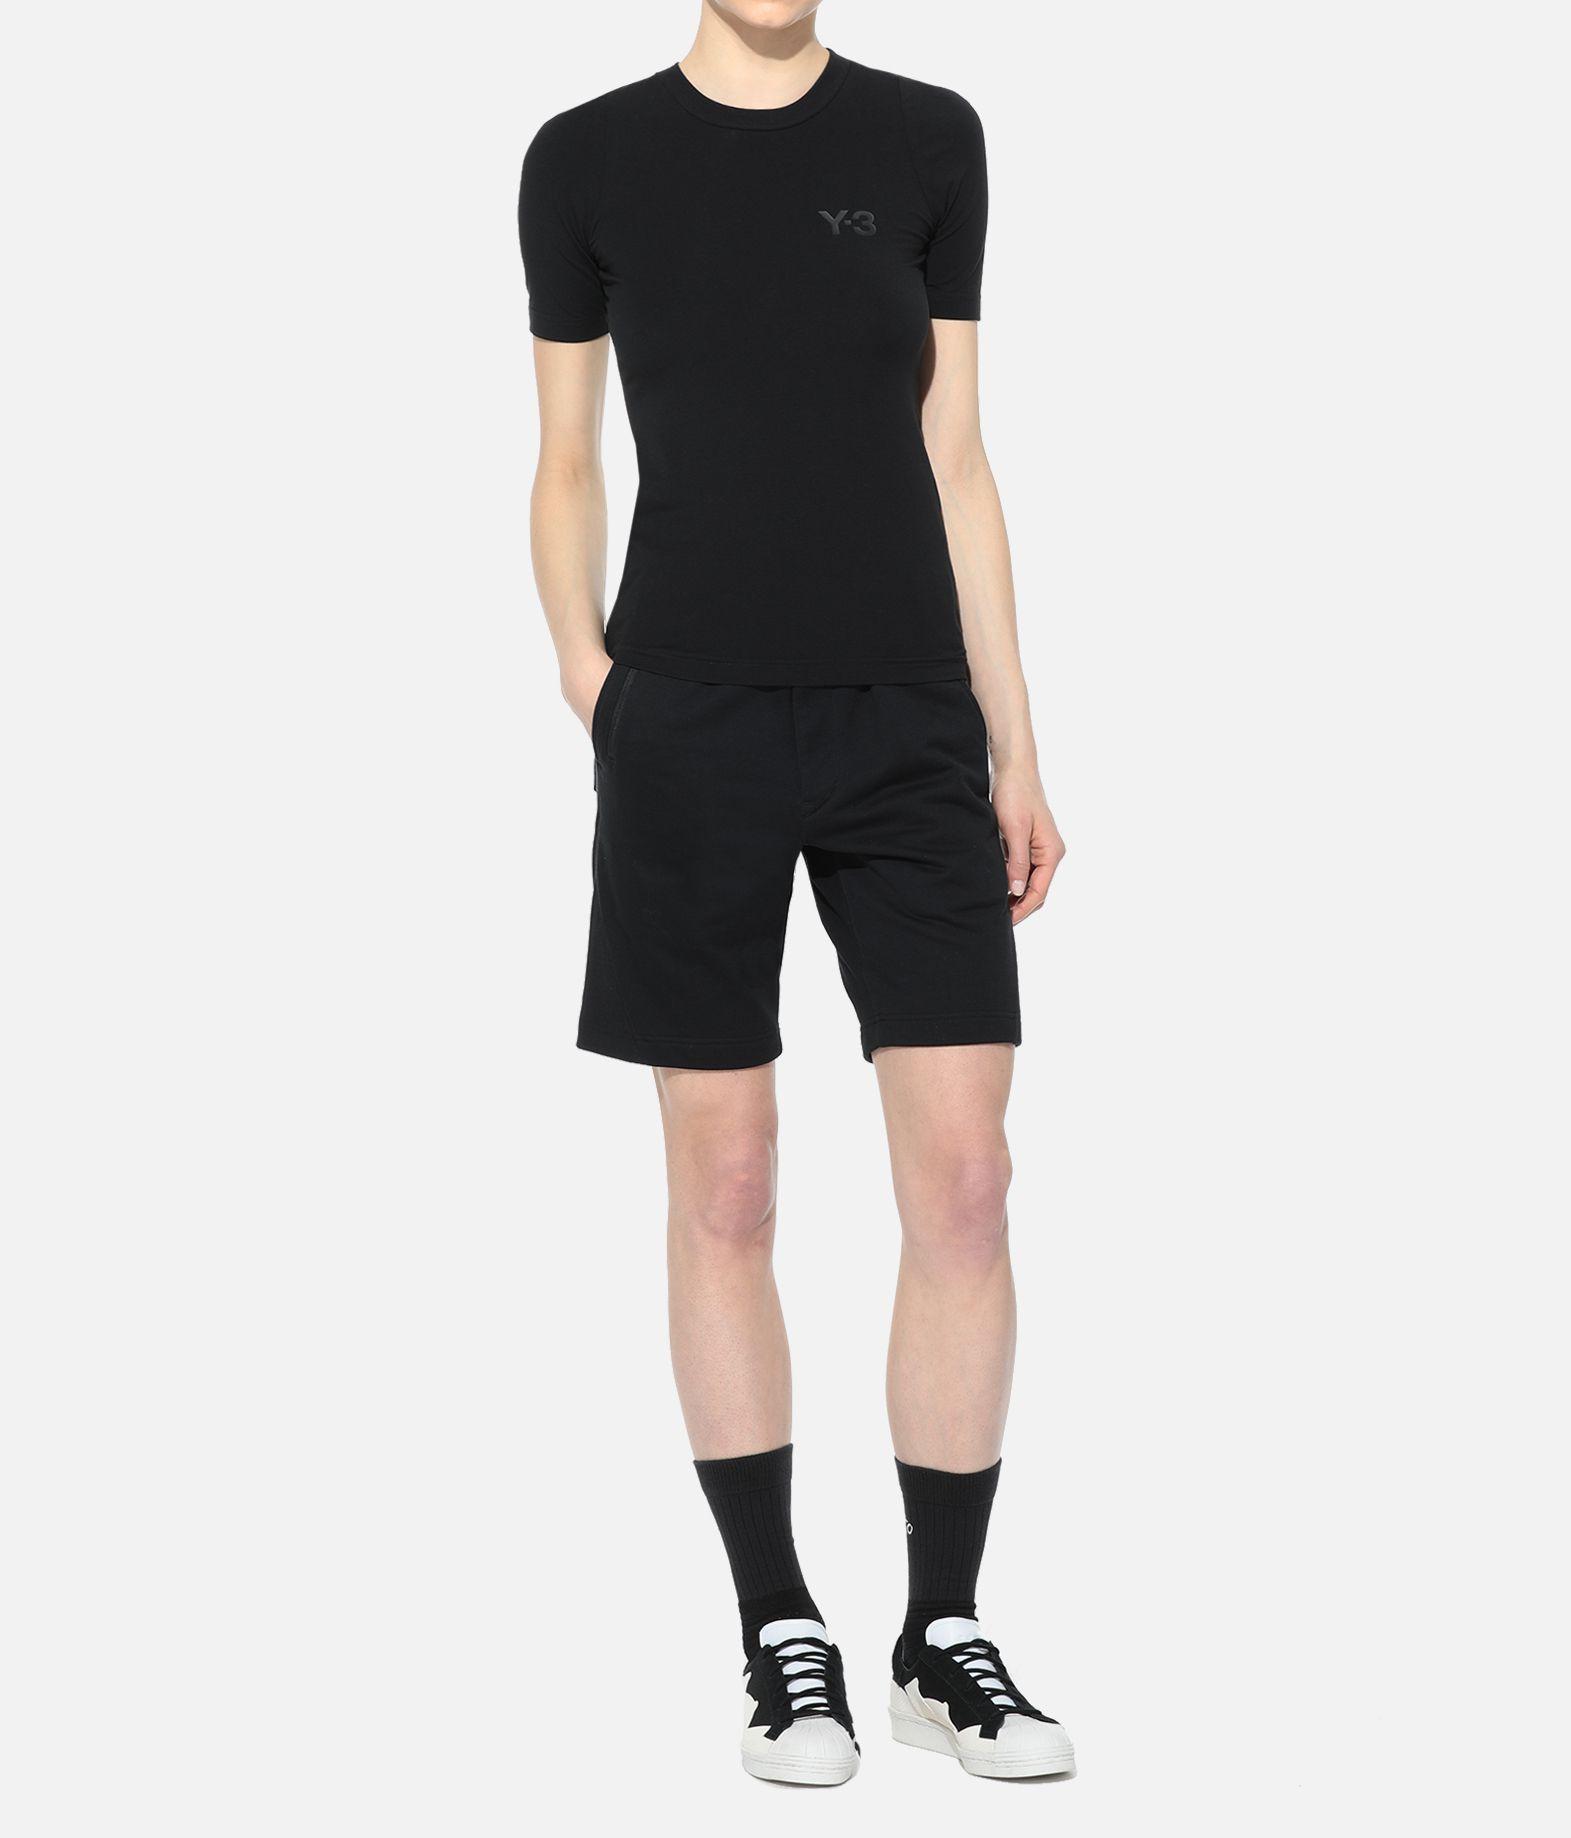 Y-3 Y-3 YOHJI TEE Kurzärmliges T-shirt Damen a